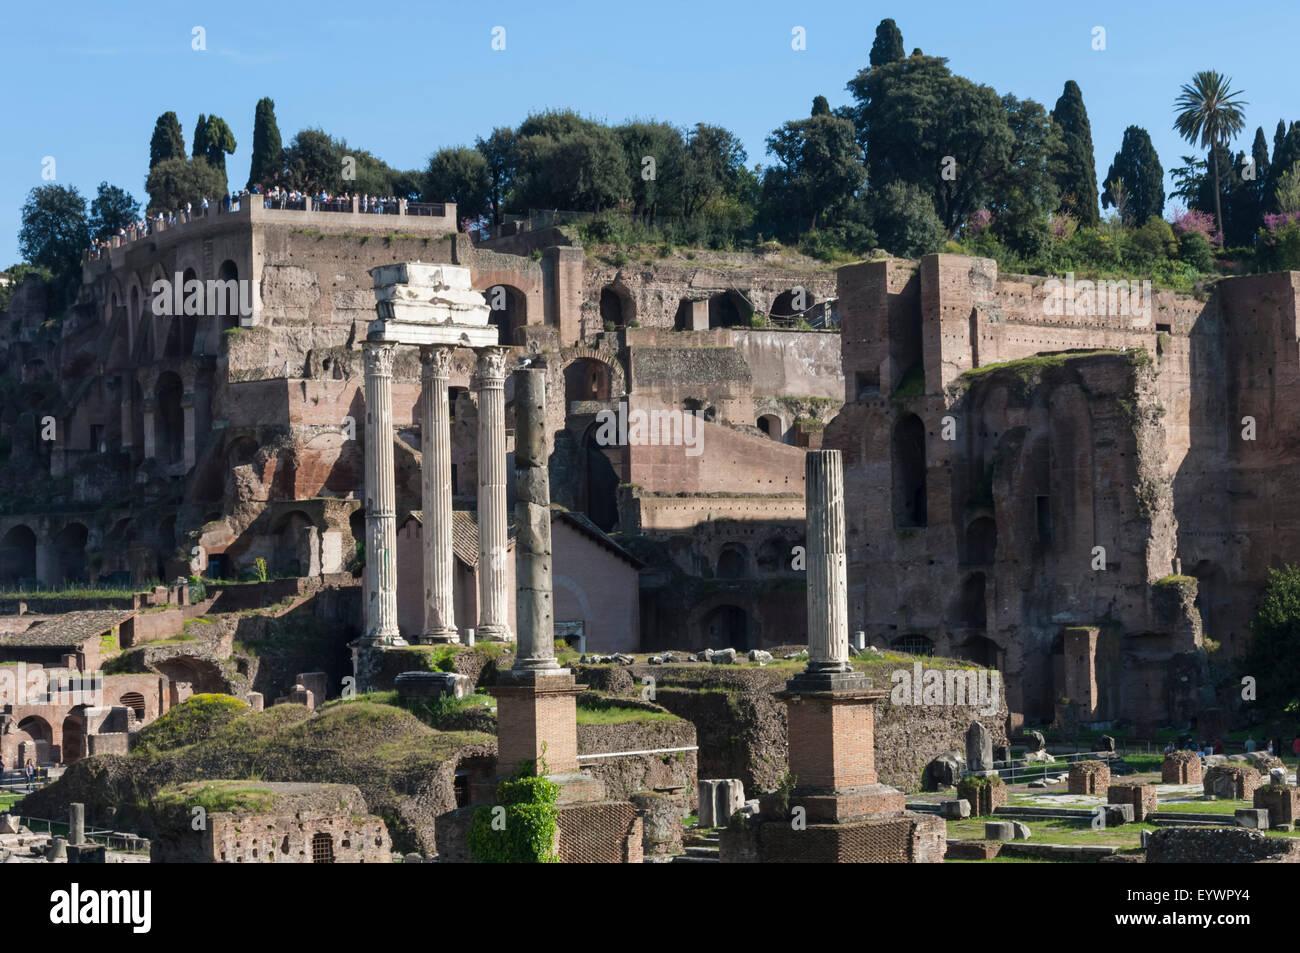 Ancient Roman Forum and the three columns of Temple of Castor and Pollux, UNESCO World Heritage Site, Rome, Lazio, Stock Photo